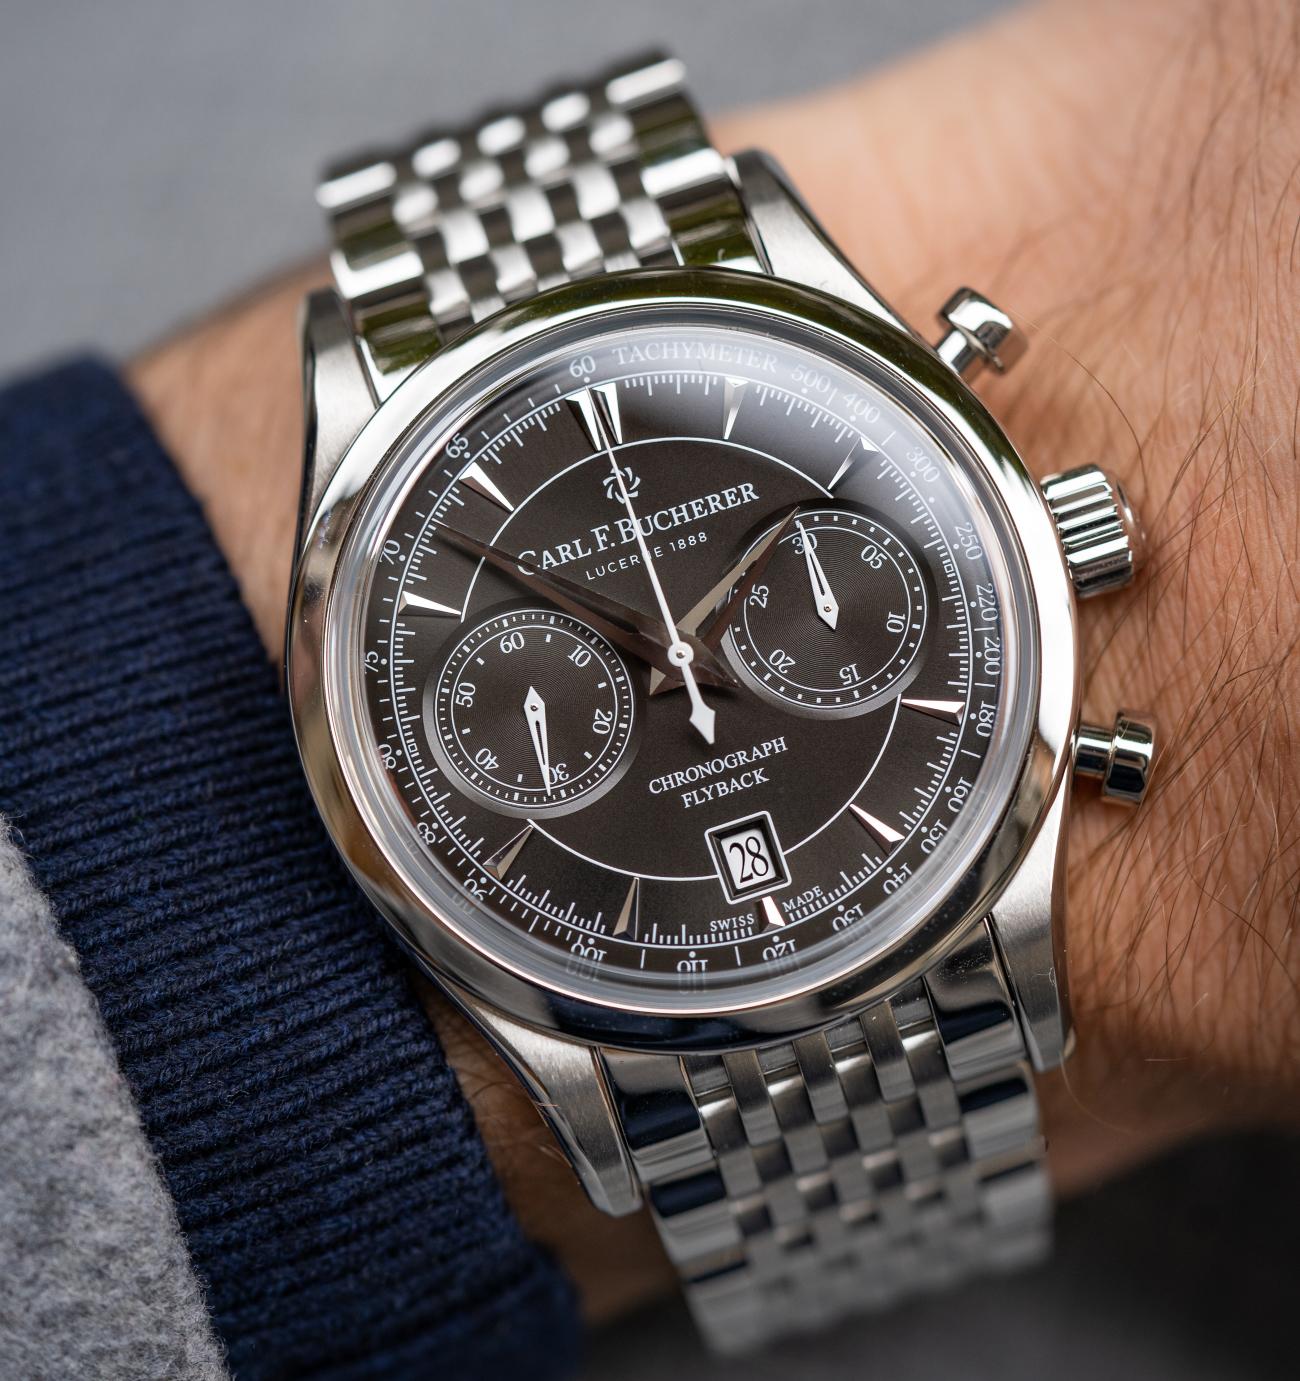 Carl_f_Bucherer_maneroflyback_with_metal_bracelet_and_brilliant_black_dial_-Europa_Star_watch_magazine_2020